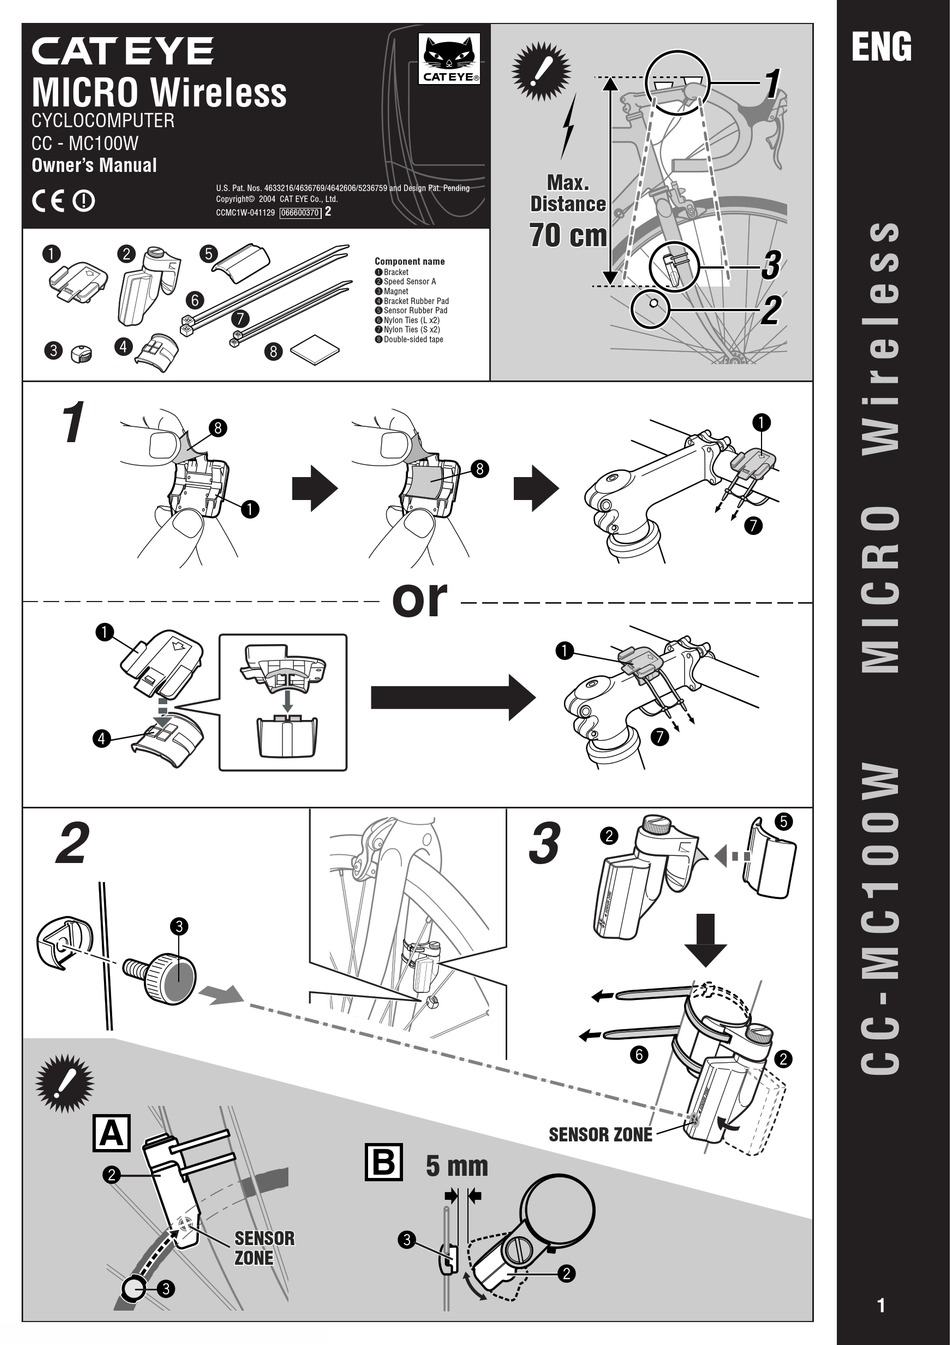 Cateye vectra cc 7000 user manual